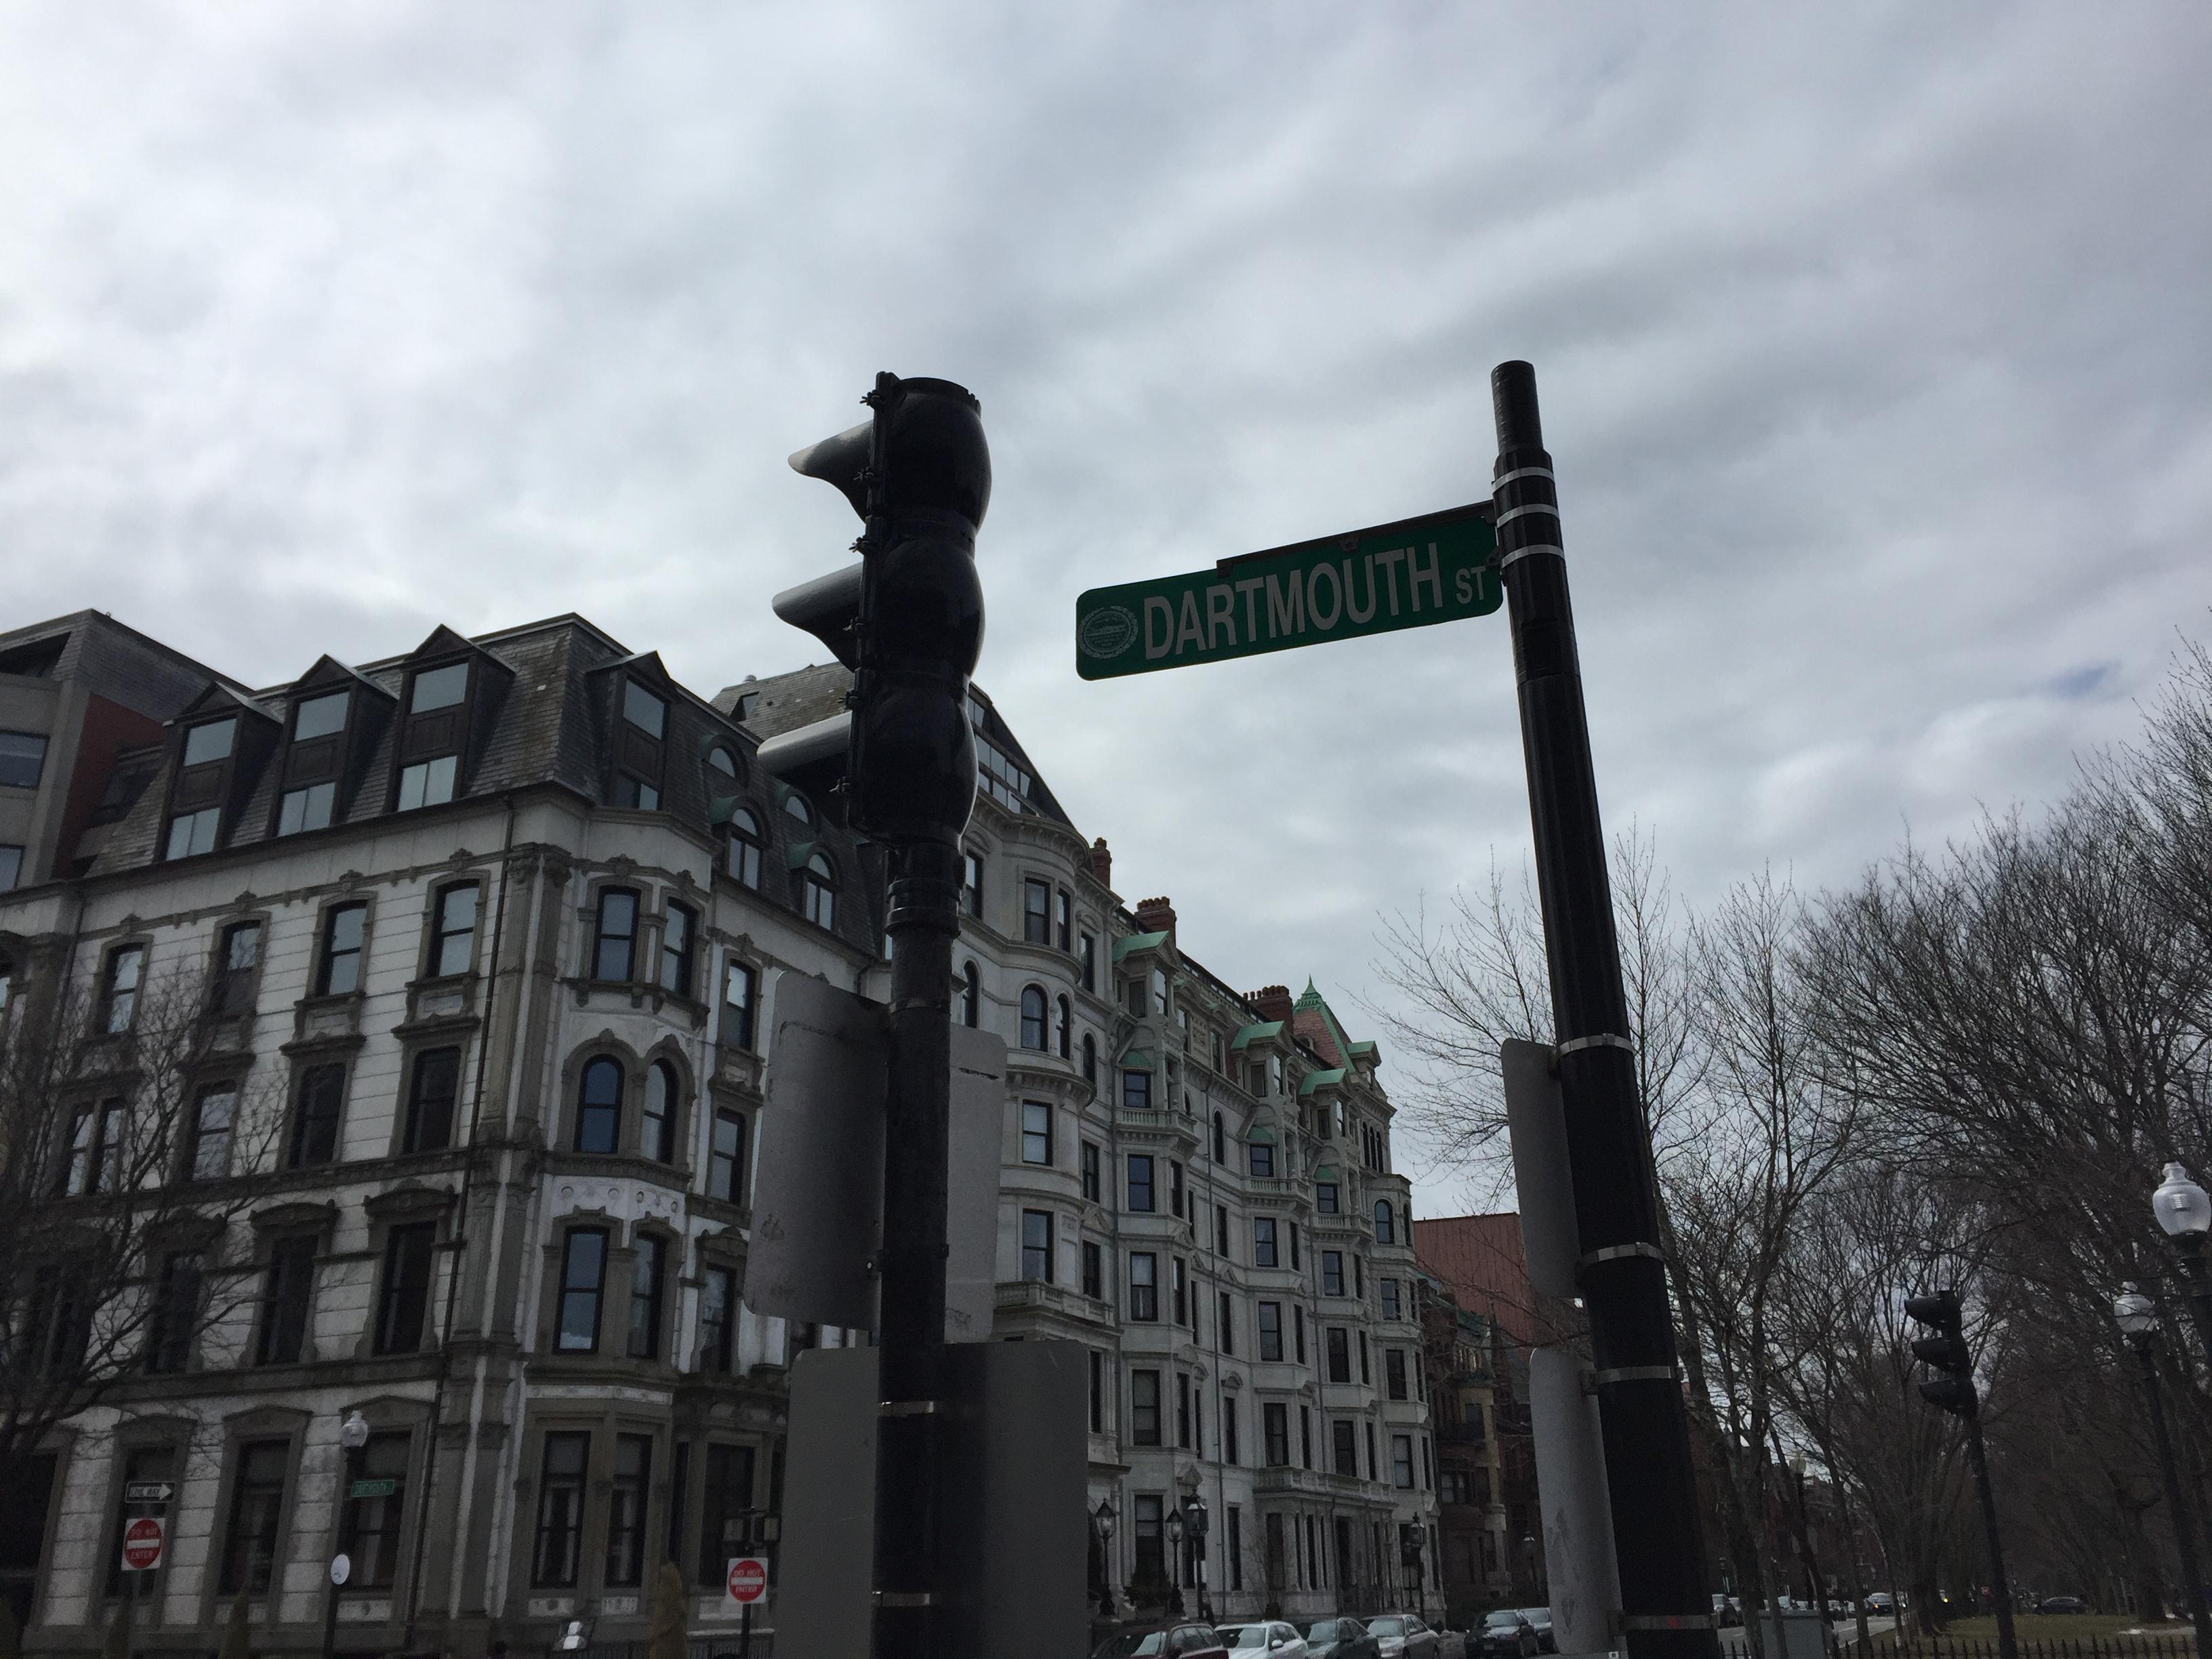 """Dartmouth Street"" sign, Boston, MA"